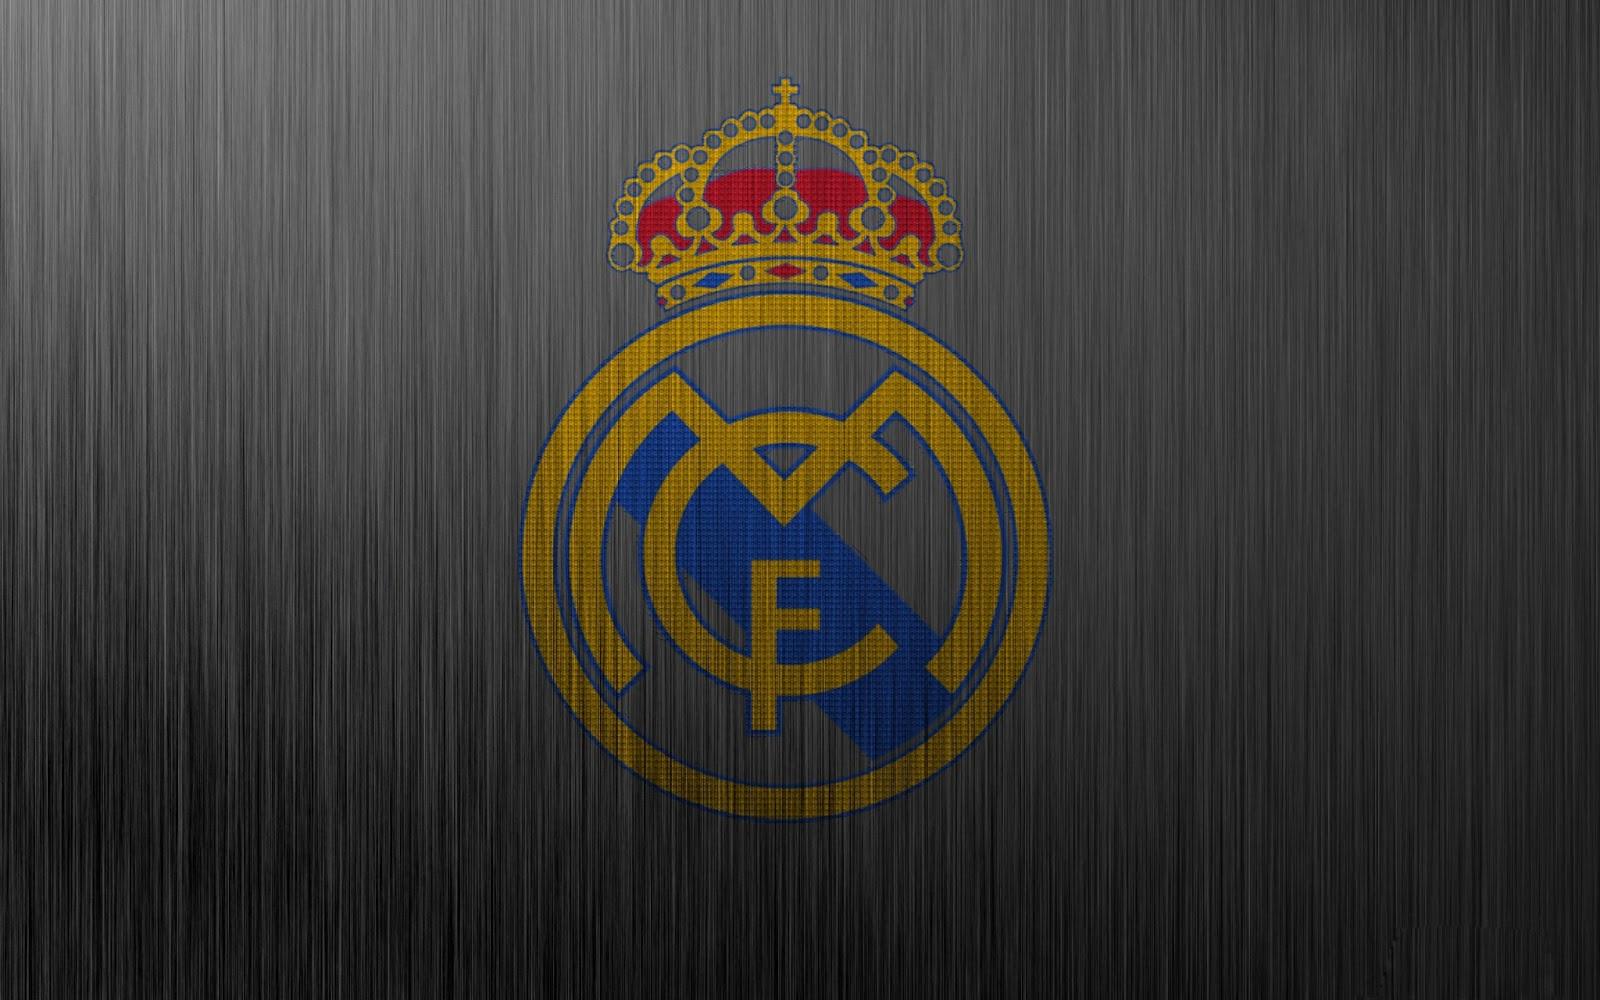 Real Madrid FC Logo 2013 HD Wallpaper of Football   hdwallpaper2013 1600x1000